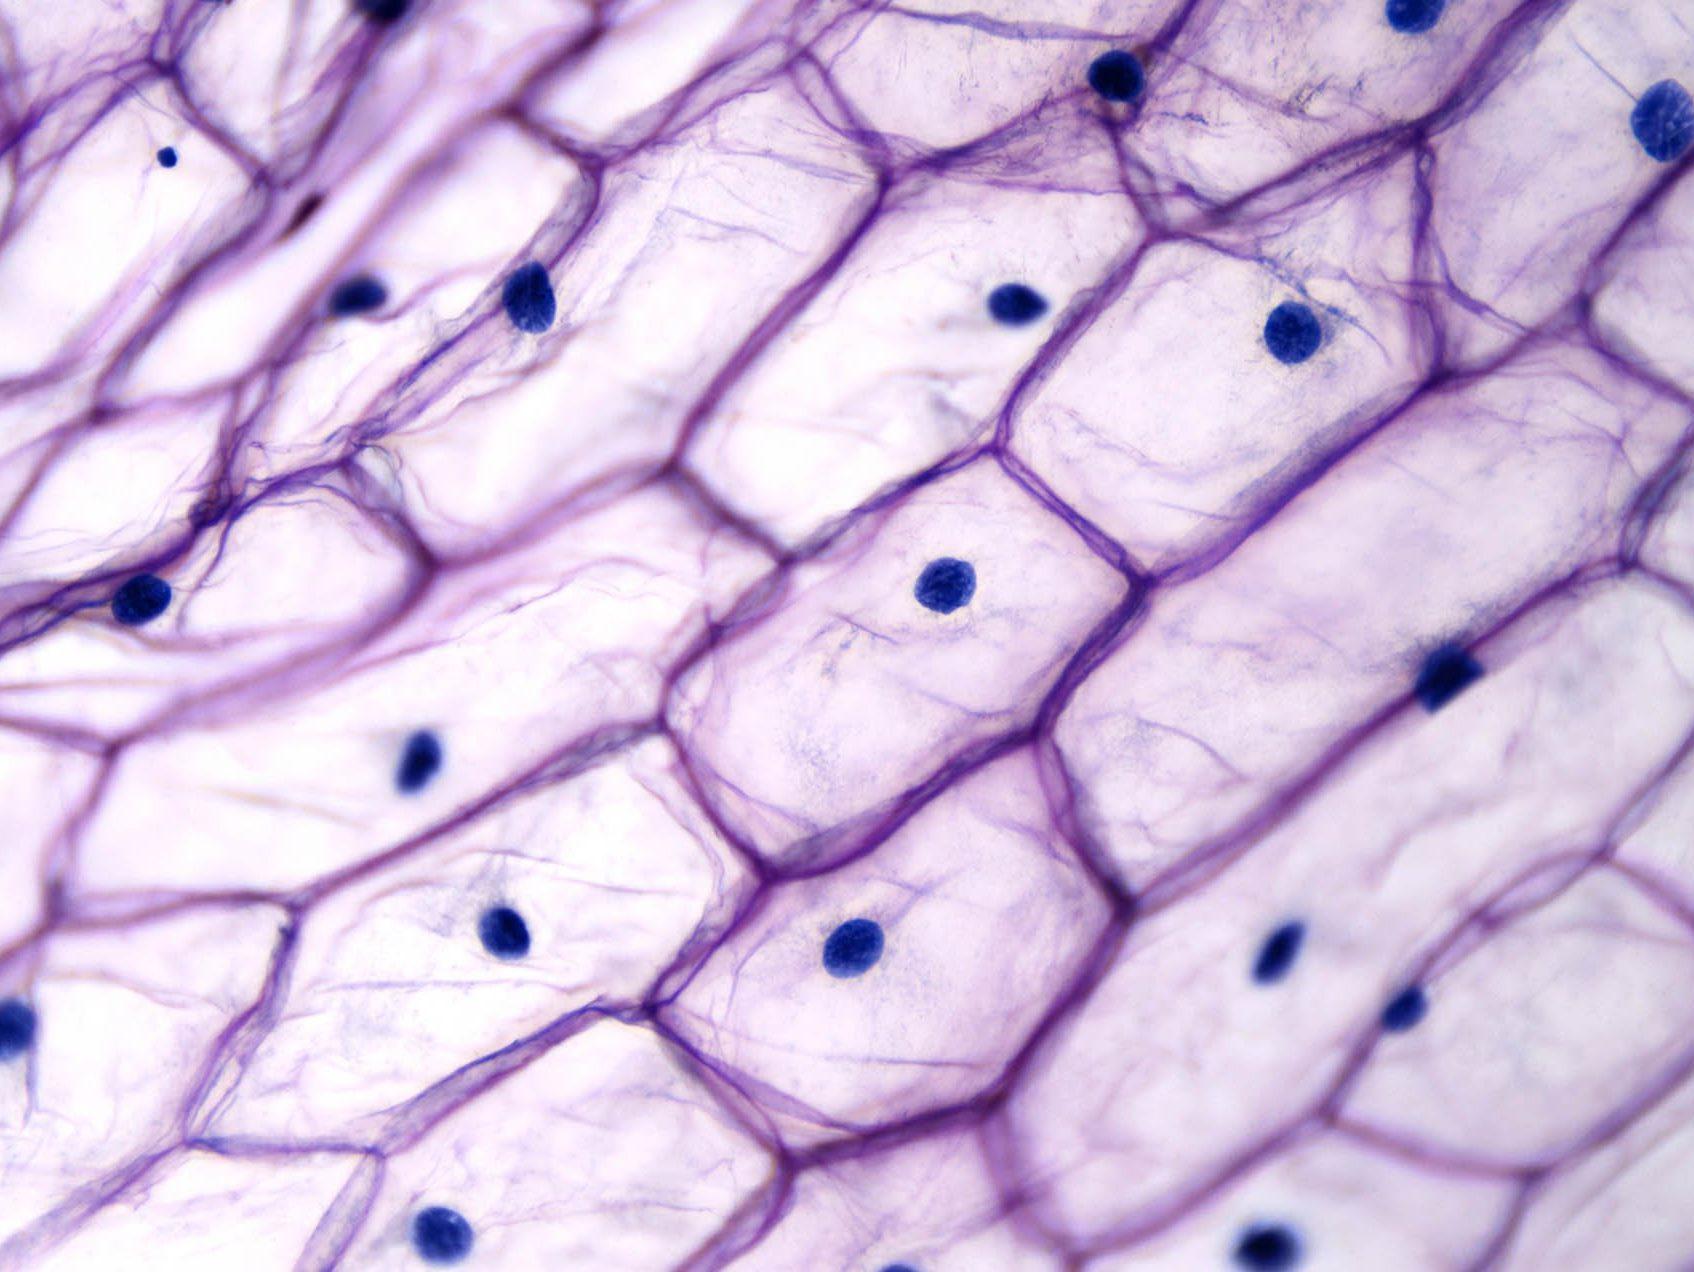 https://www.hospitex.com/wp-content/uploads/2019/09/Hospitex-Cytofast-3-–-il-mondo-della-citologia-e1596019226917.jpg